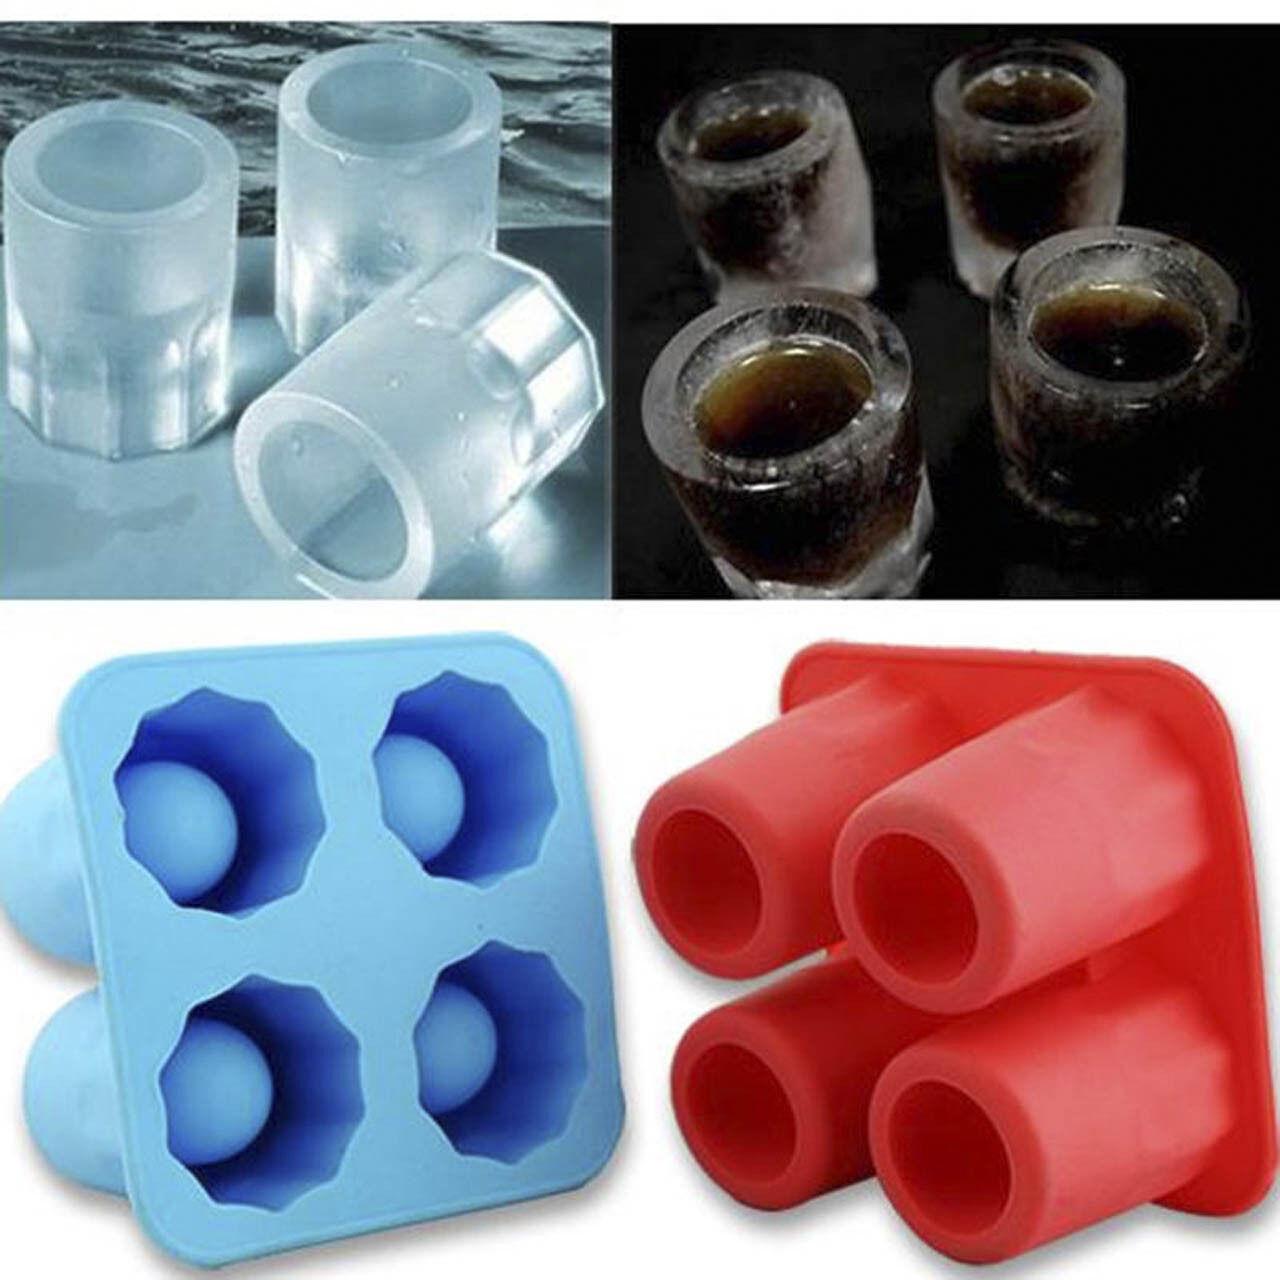 FRED Cool Shooters shot glass ice mold tray BNIB Make ice shot glasses Vodka